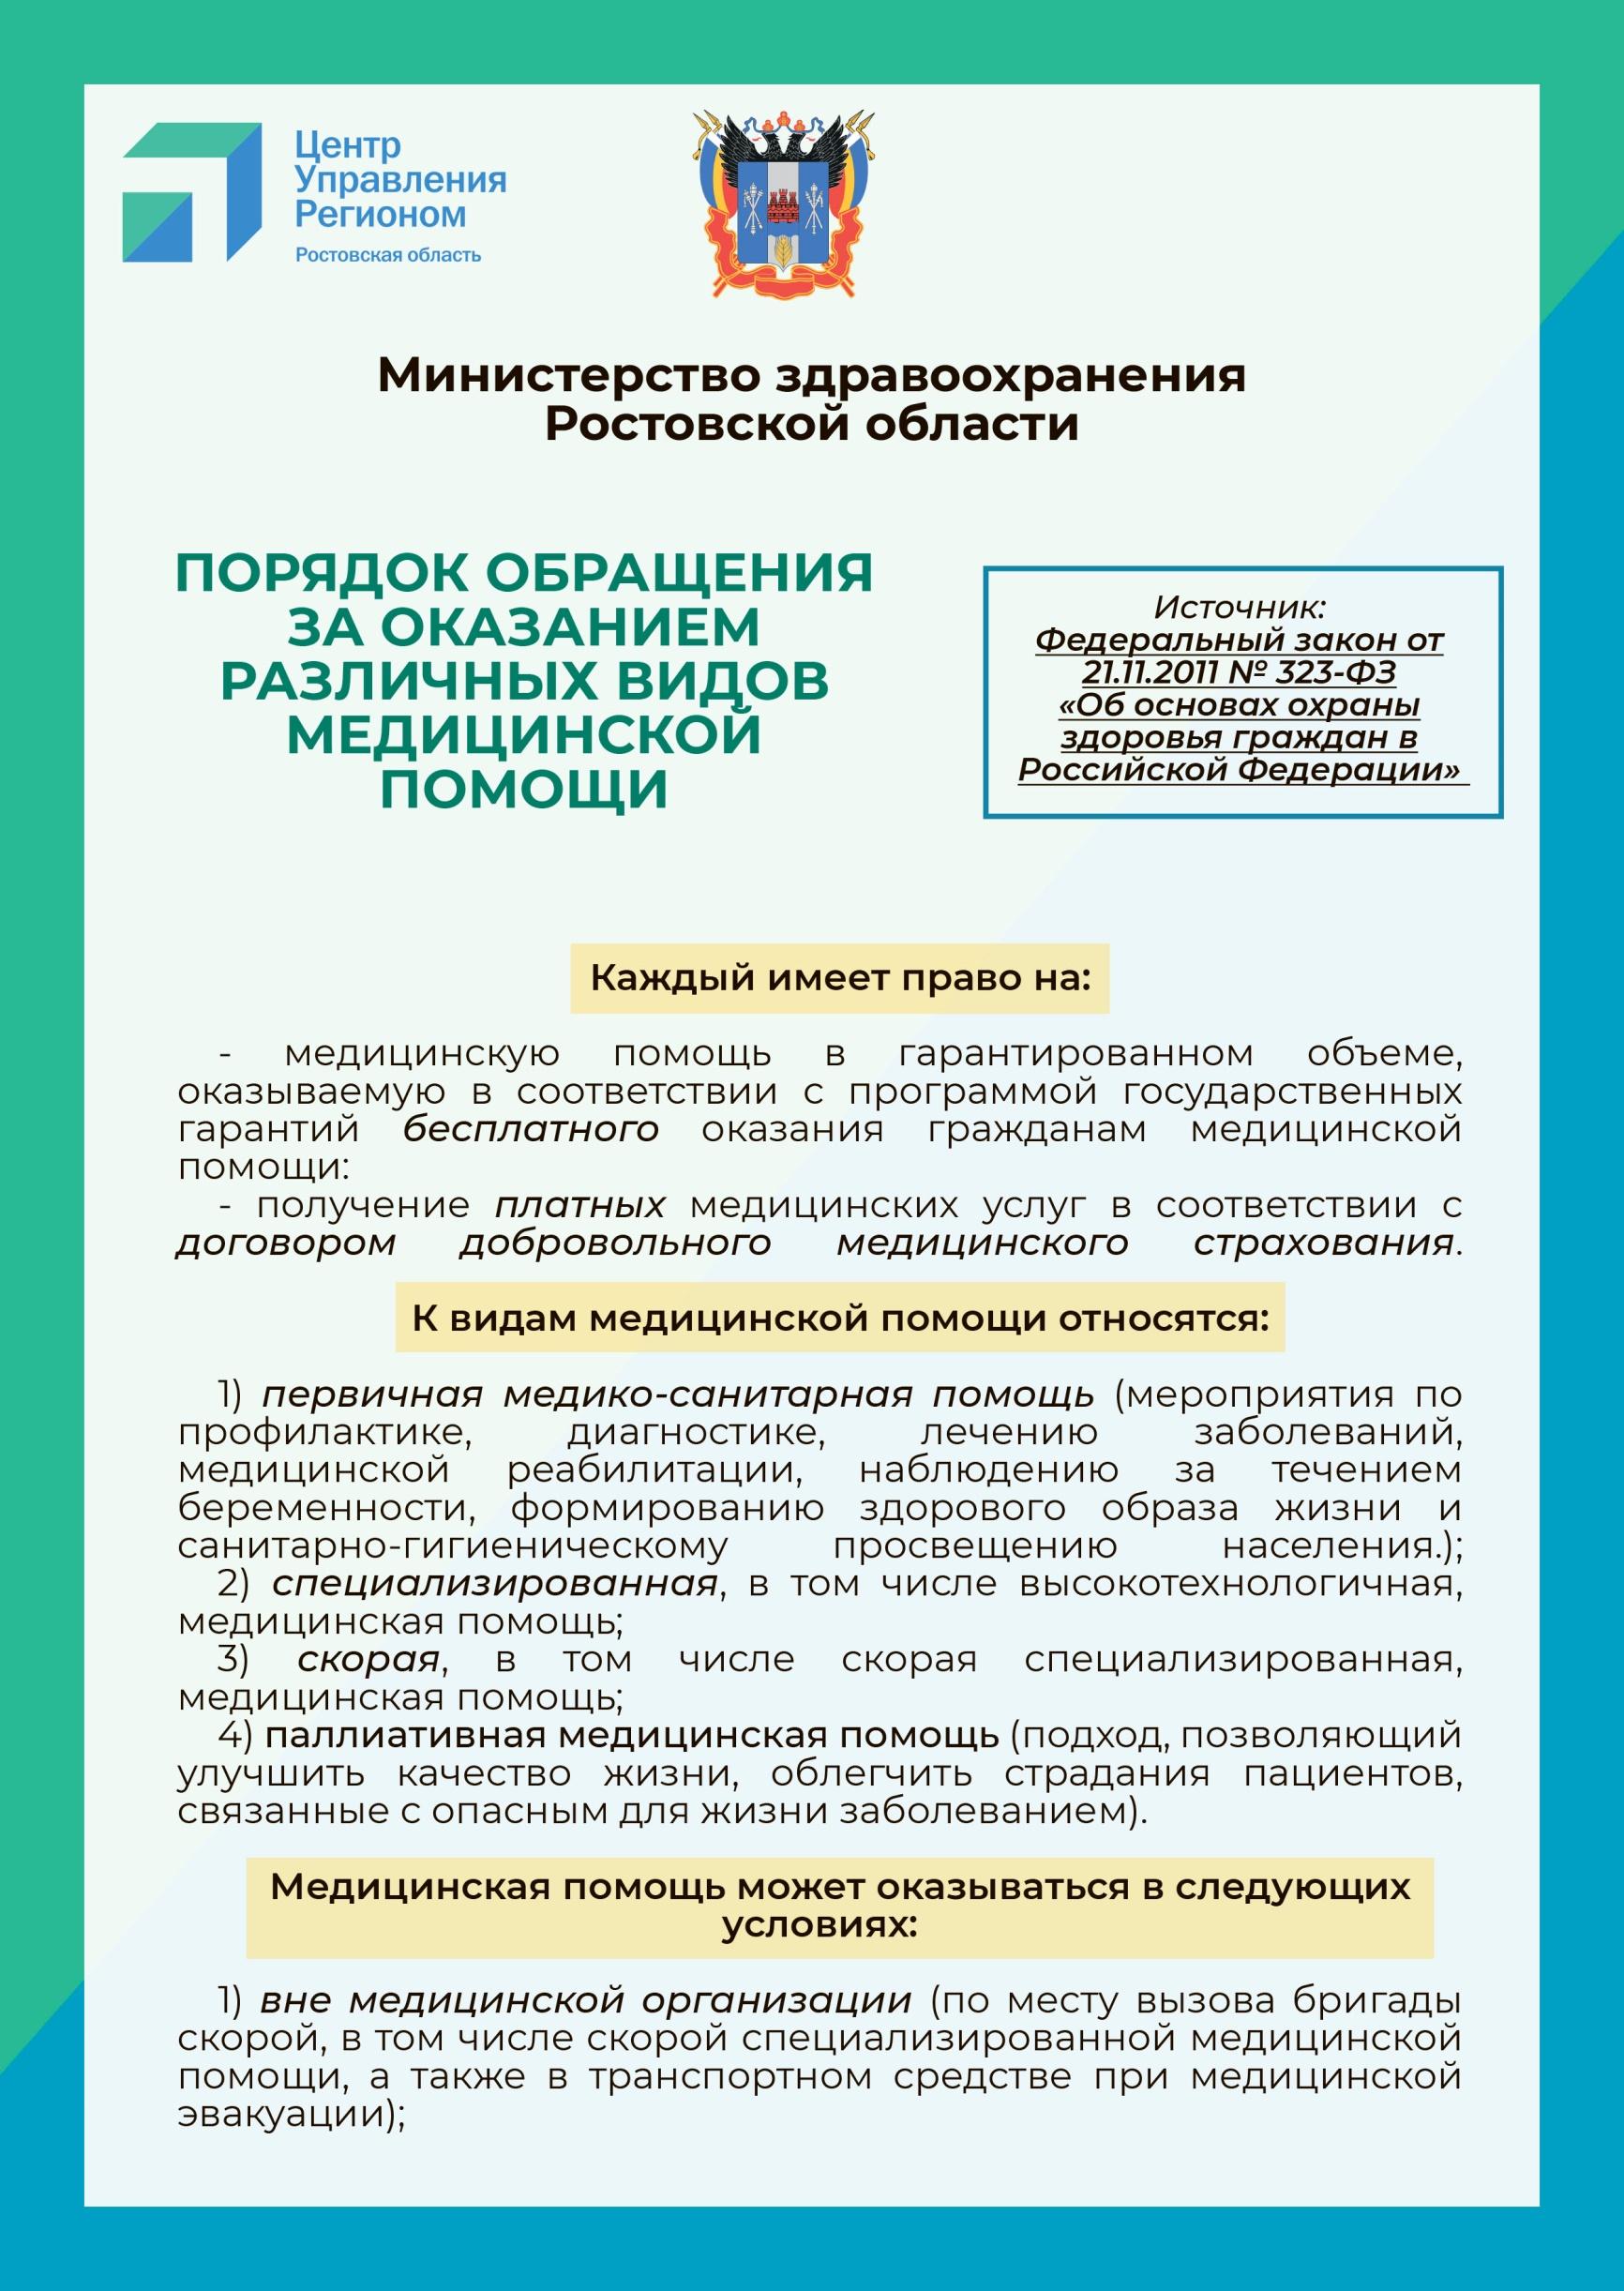 C:\Users\user5\YandexDisk\Сайт\Картинки\Памятка для размещения на сайте-1.jpg